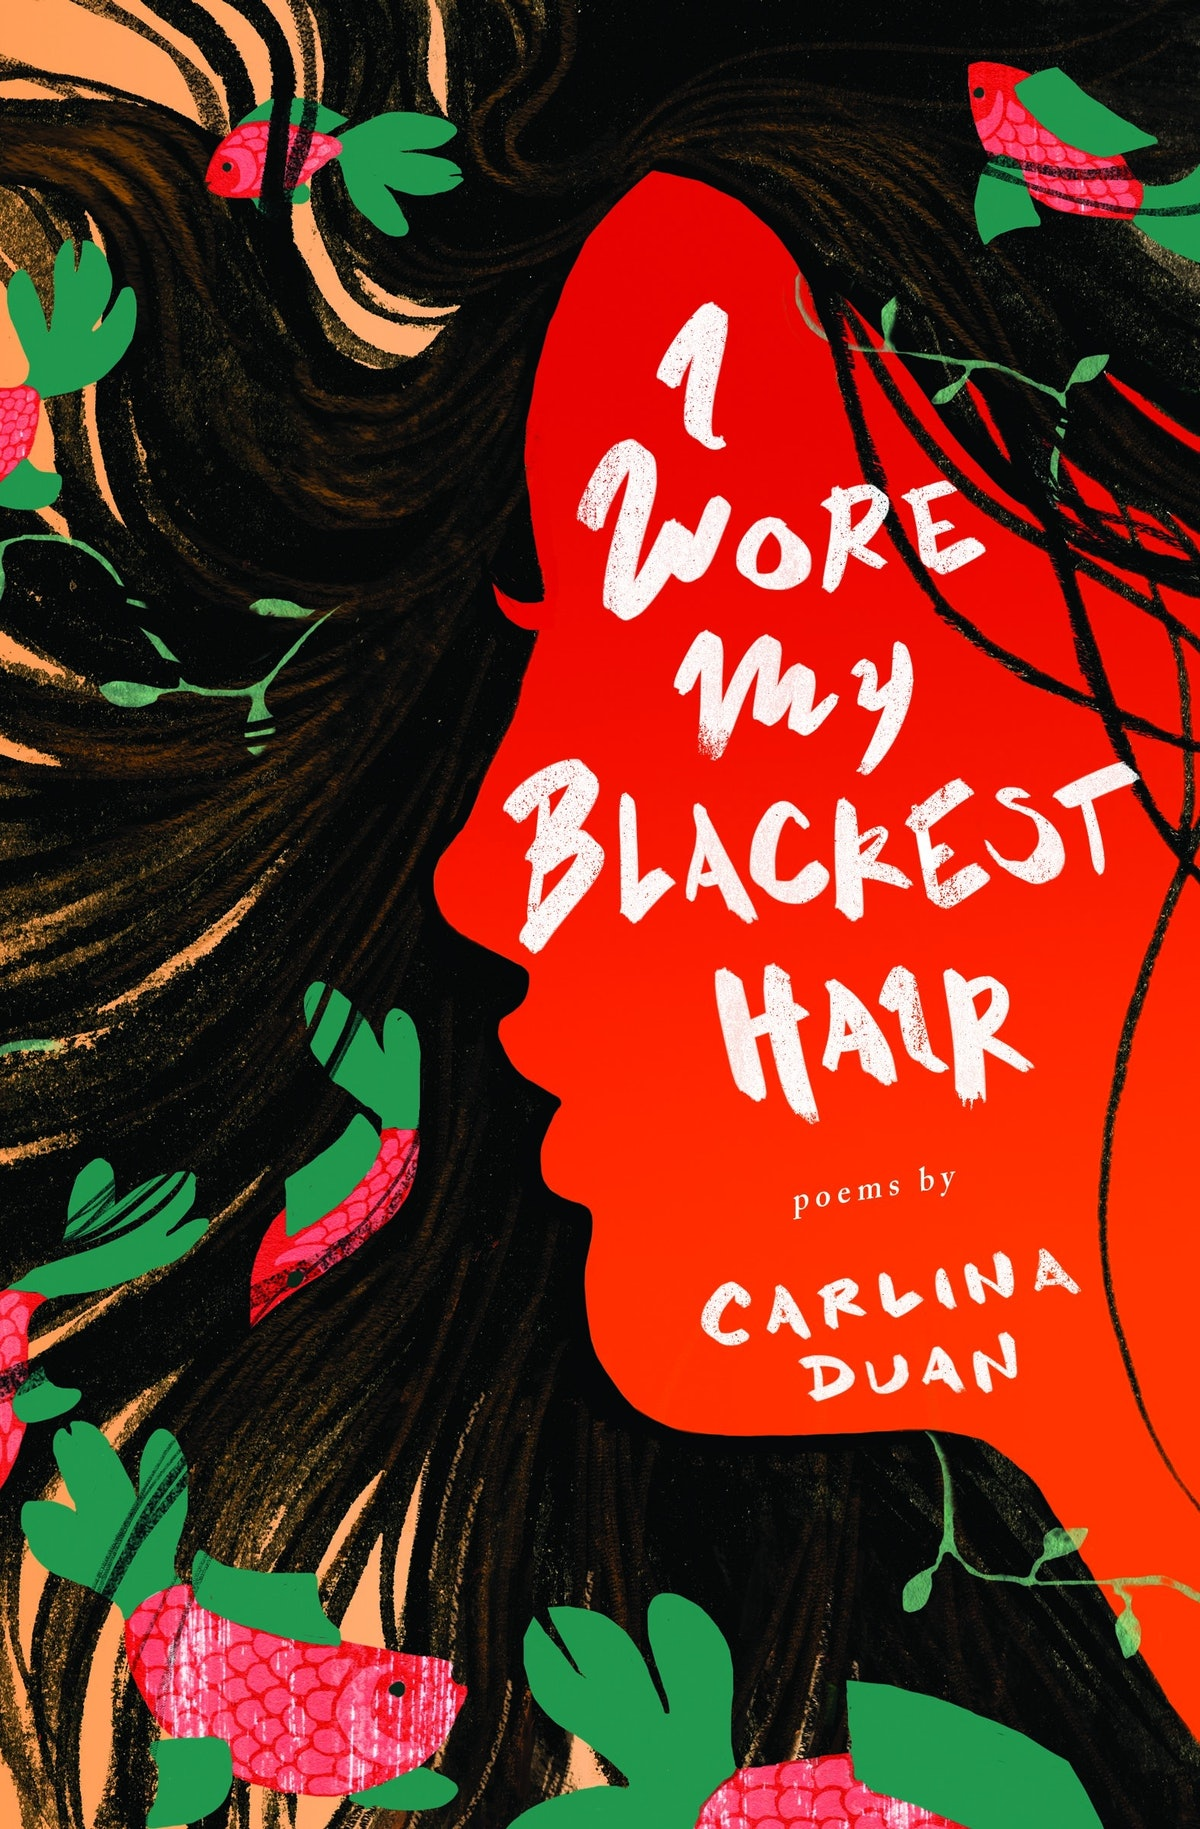 Duan-I Wore My Blackest Hair_Cover Art.jpg